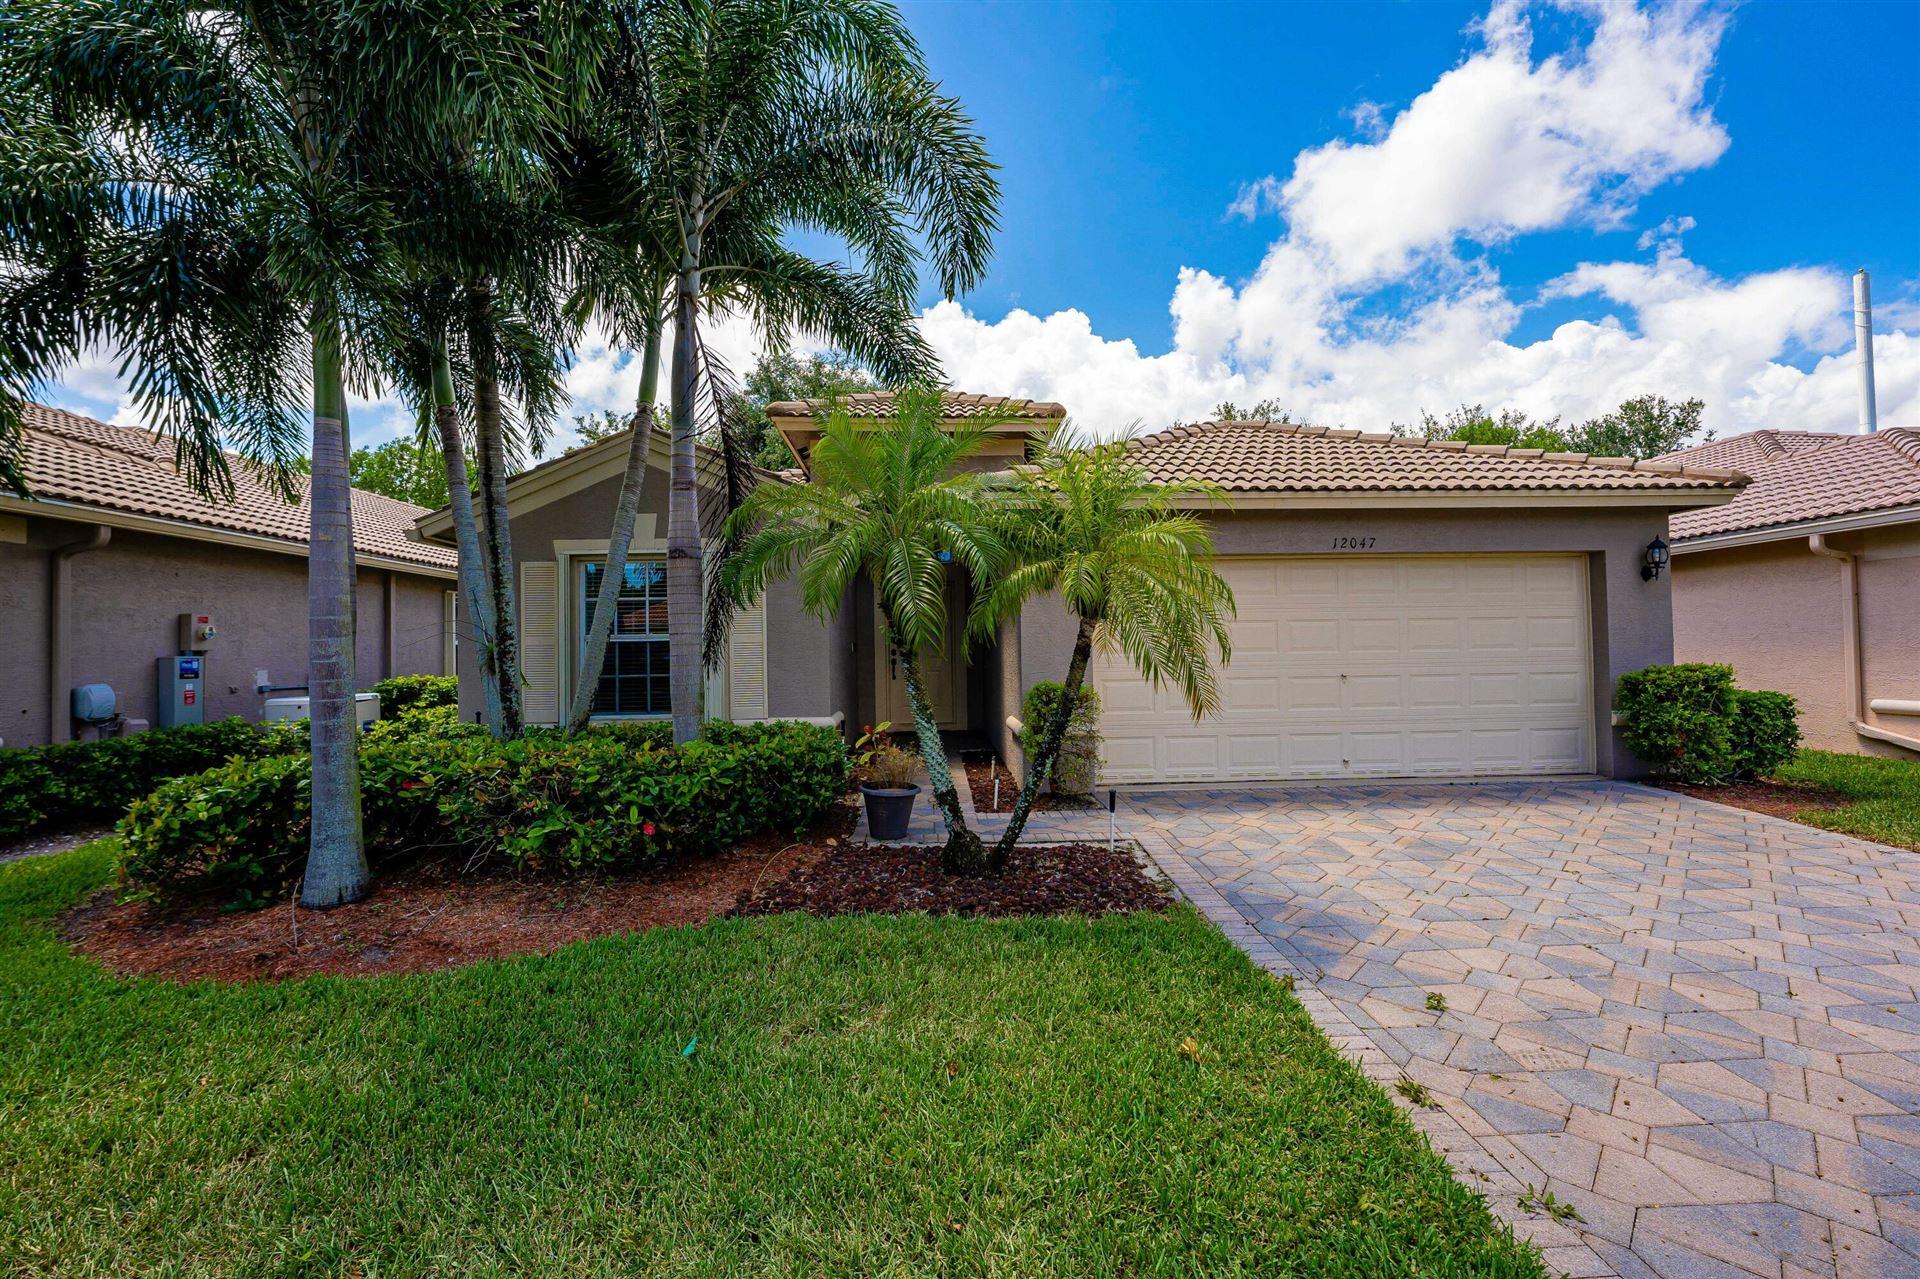 12047 Roma Road, Boynton Beach, FL 33437 - MLS#: RX-10742756